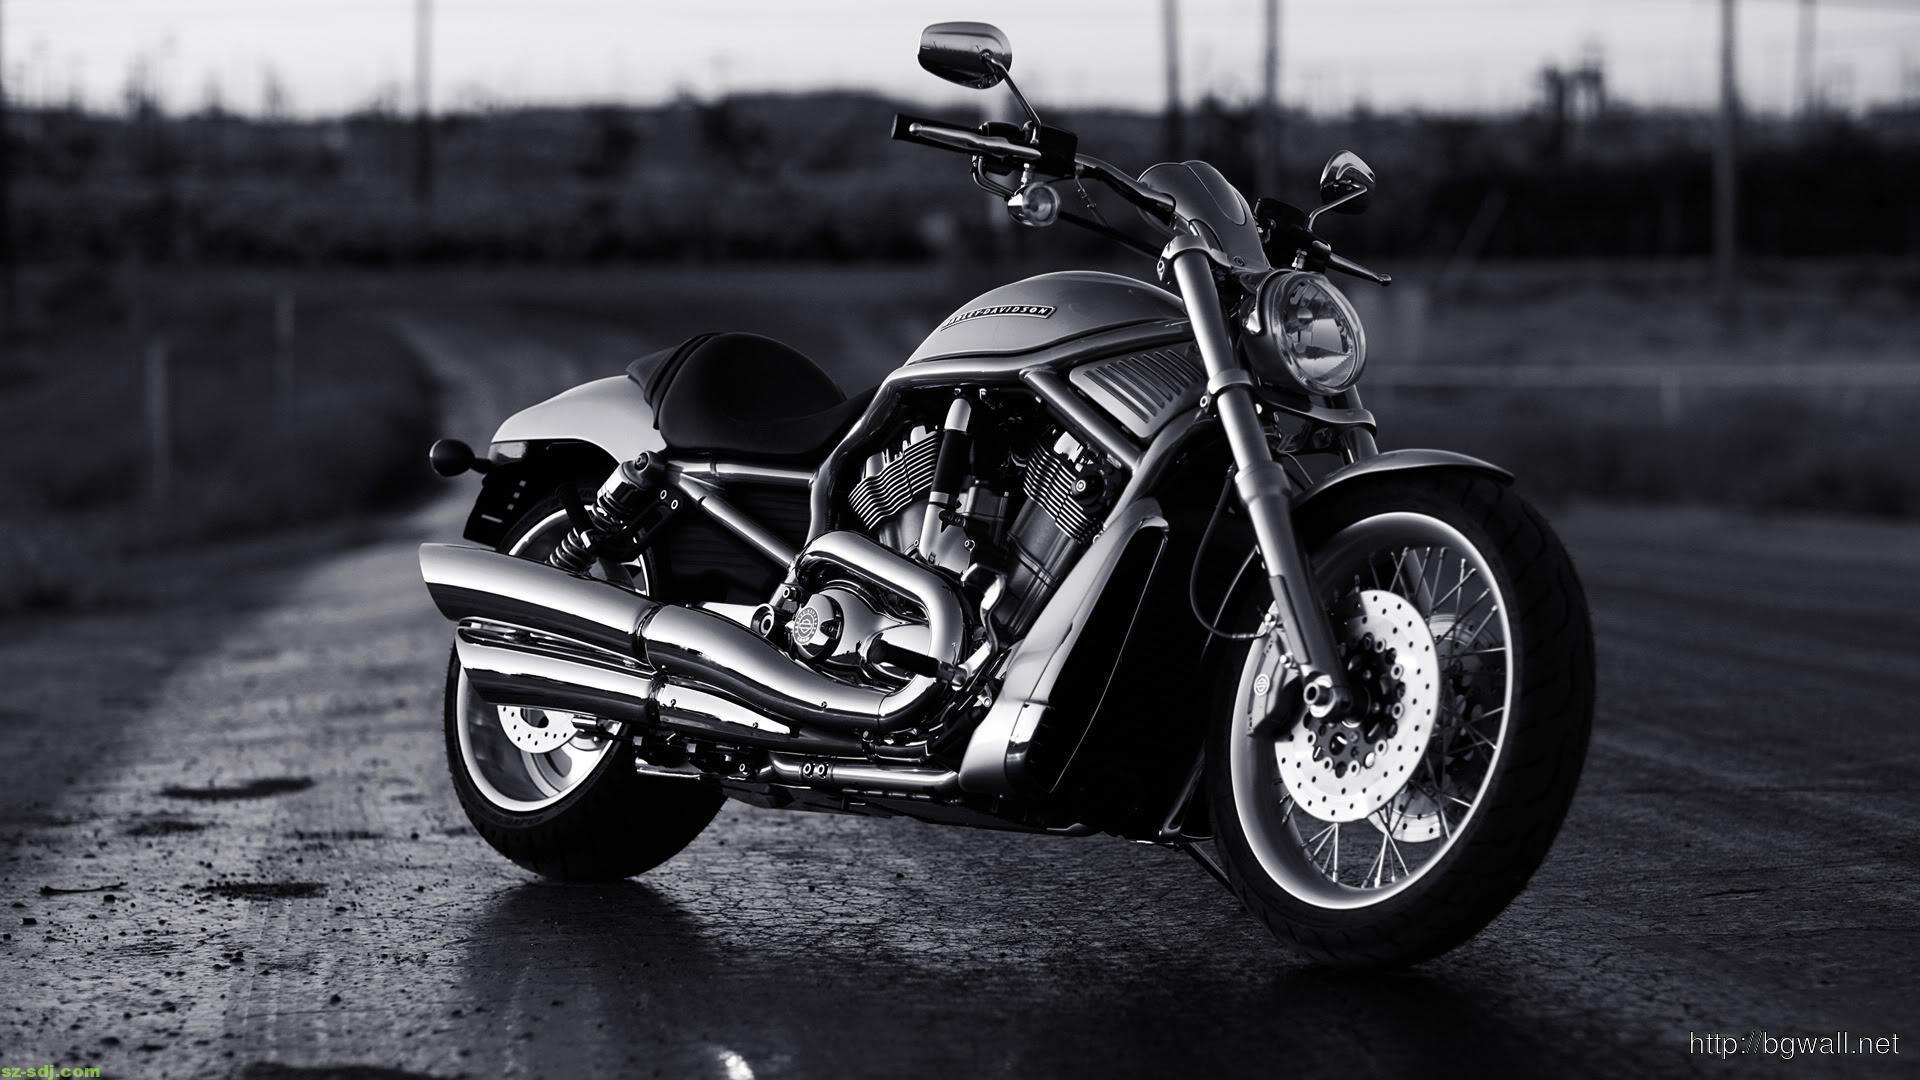 White Harley Davidson: Harley Davidson Black White Wallpaper